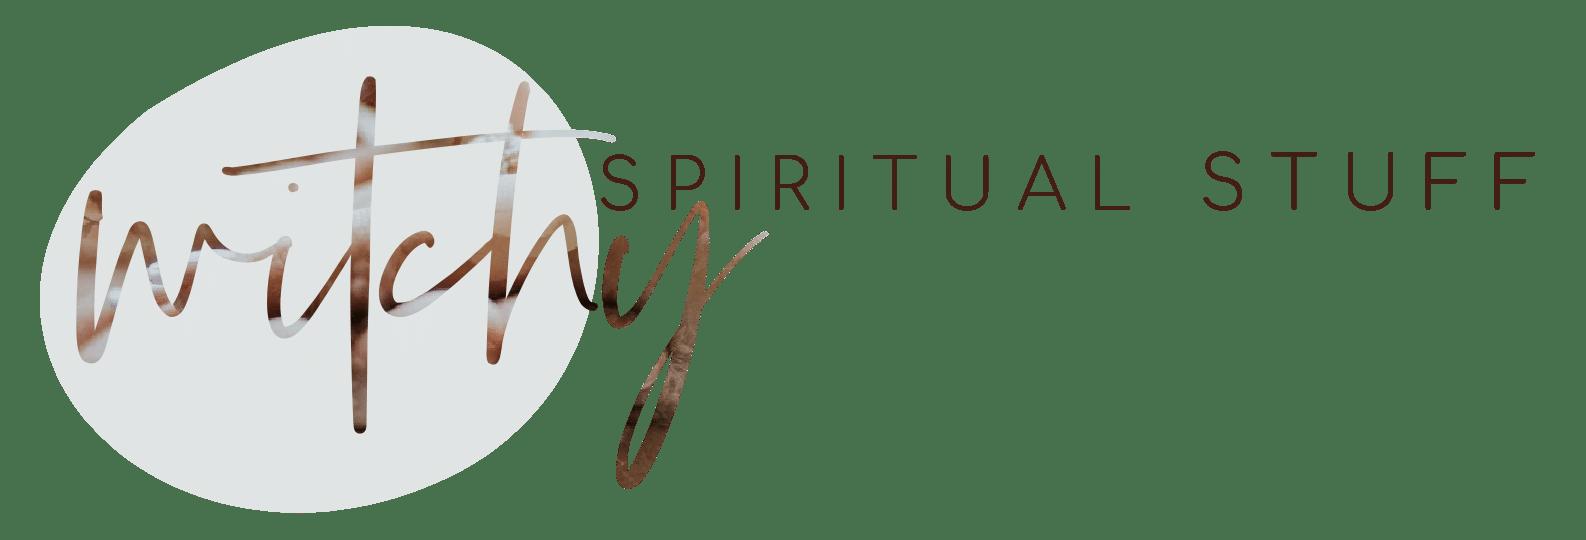 Witchy Spiritual Stuff